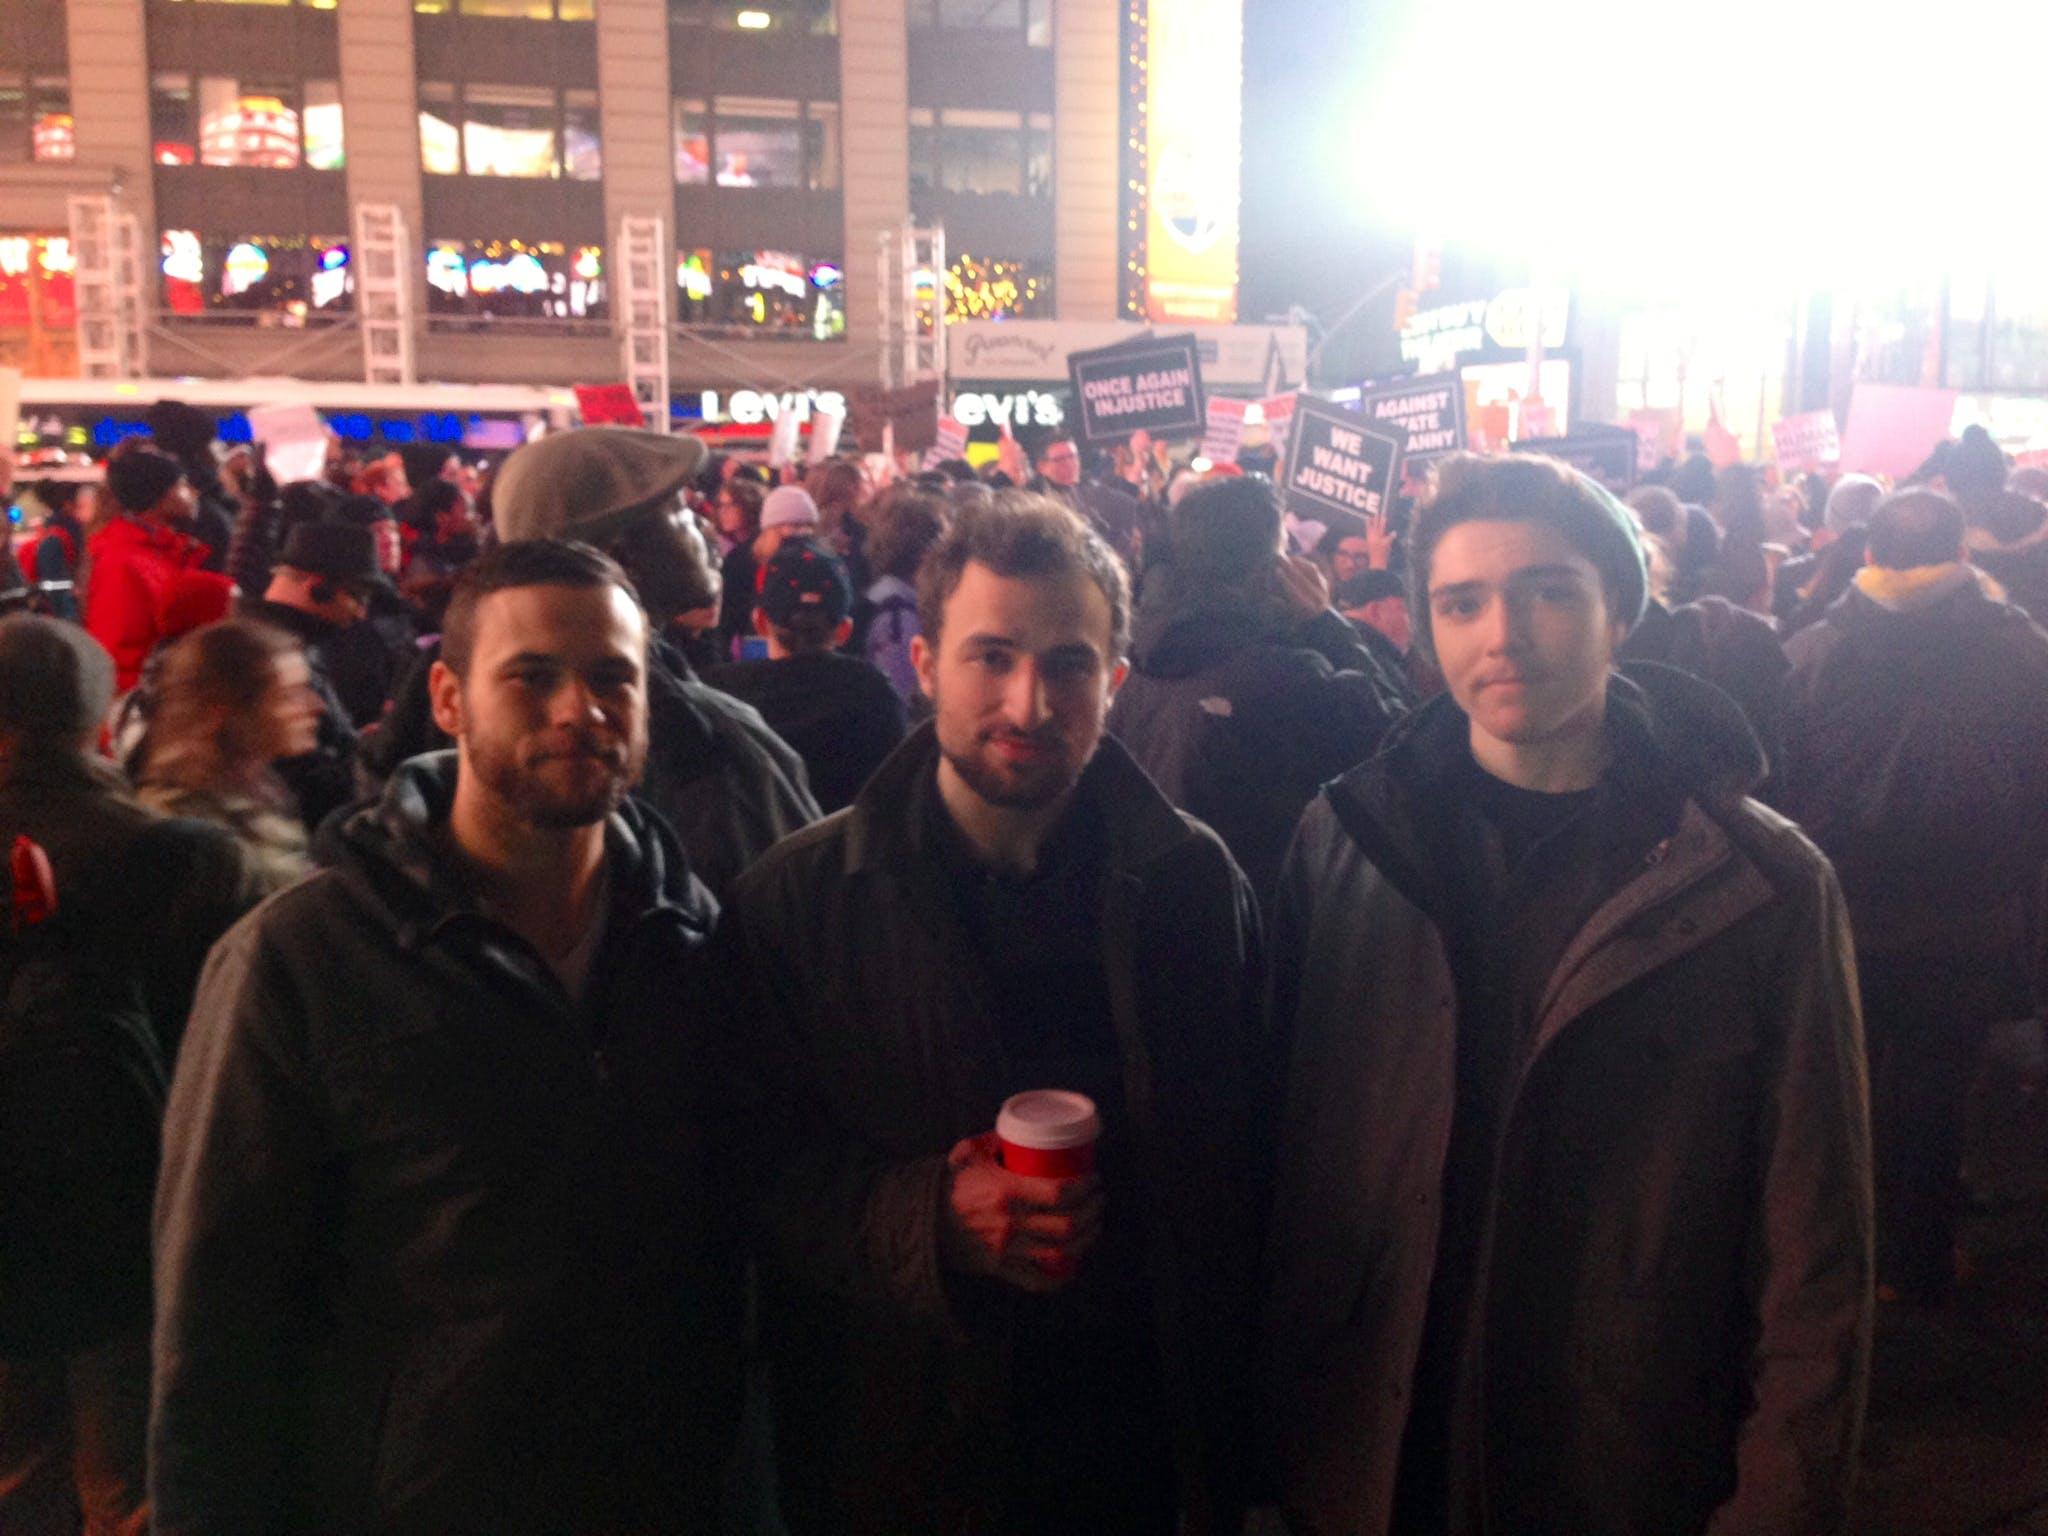 Jeff Sarkowski, Tony Malec and Selby Owens and of Scranton, Penn.